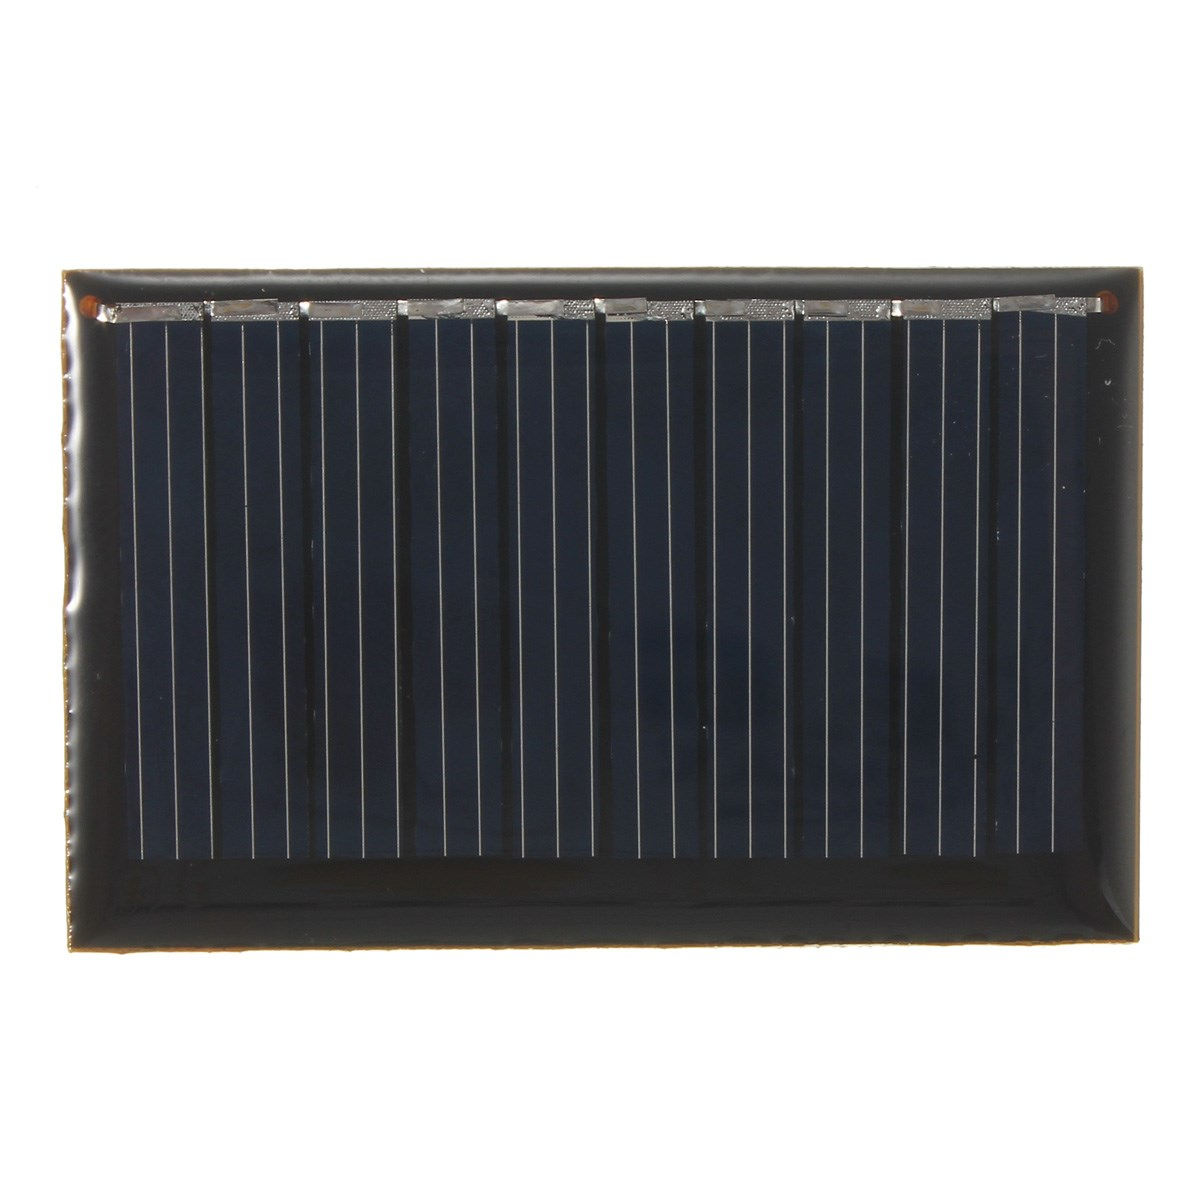 High quality 5V 0.22W 45mA Polycrystalline Silicon Epoxy Solar Panel DIY Module Mini Solar Cells Battery Phone charger